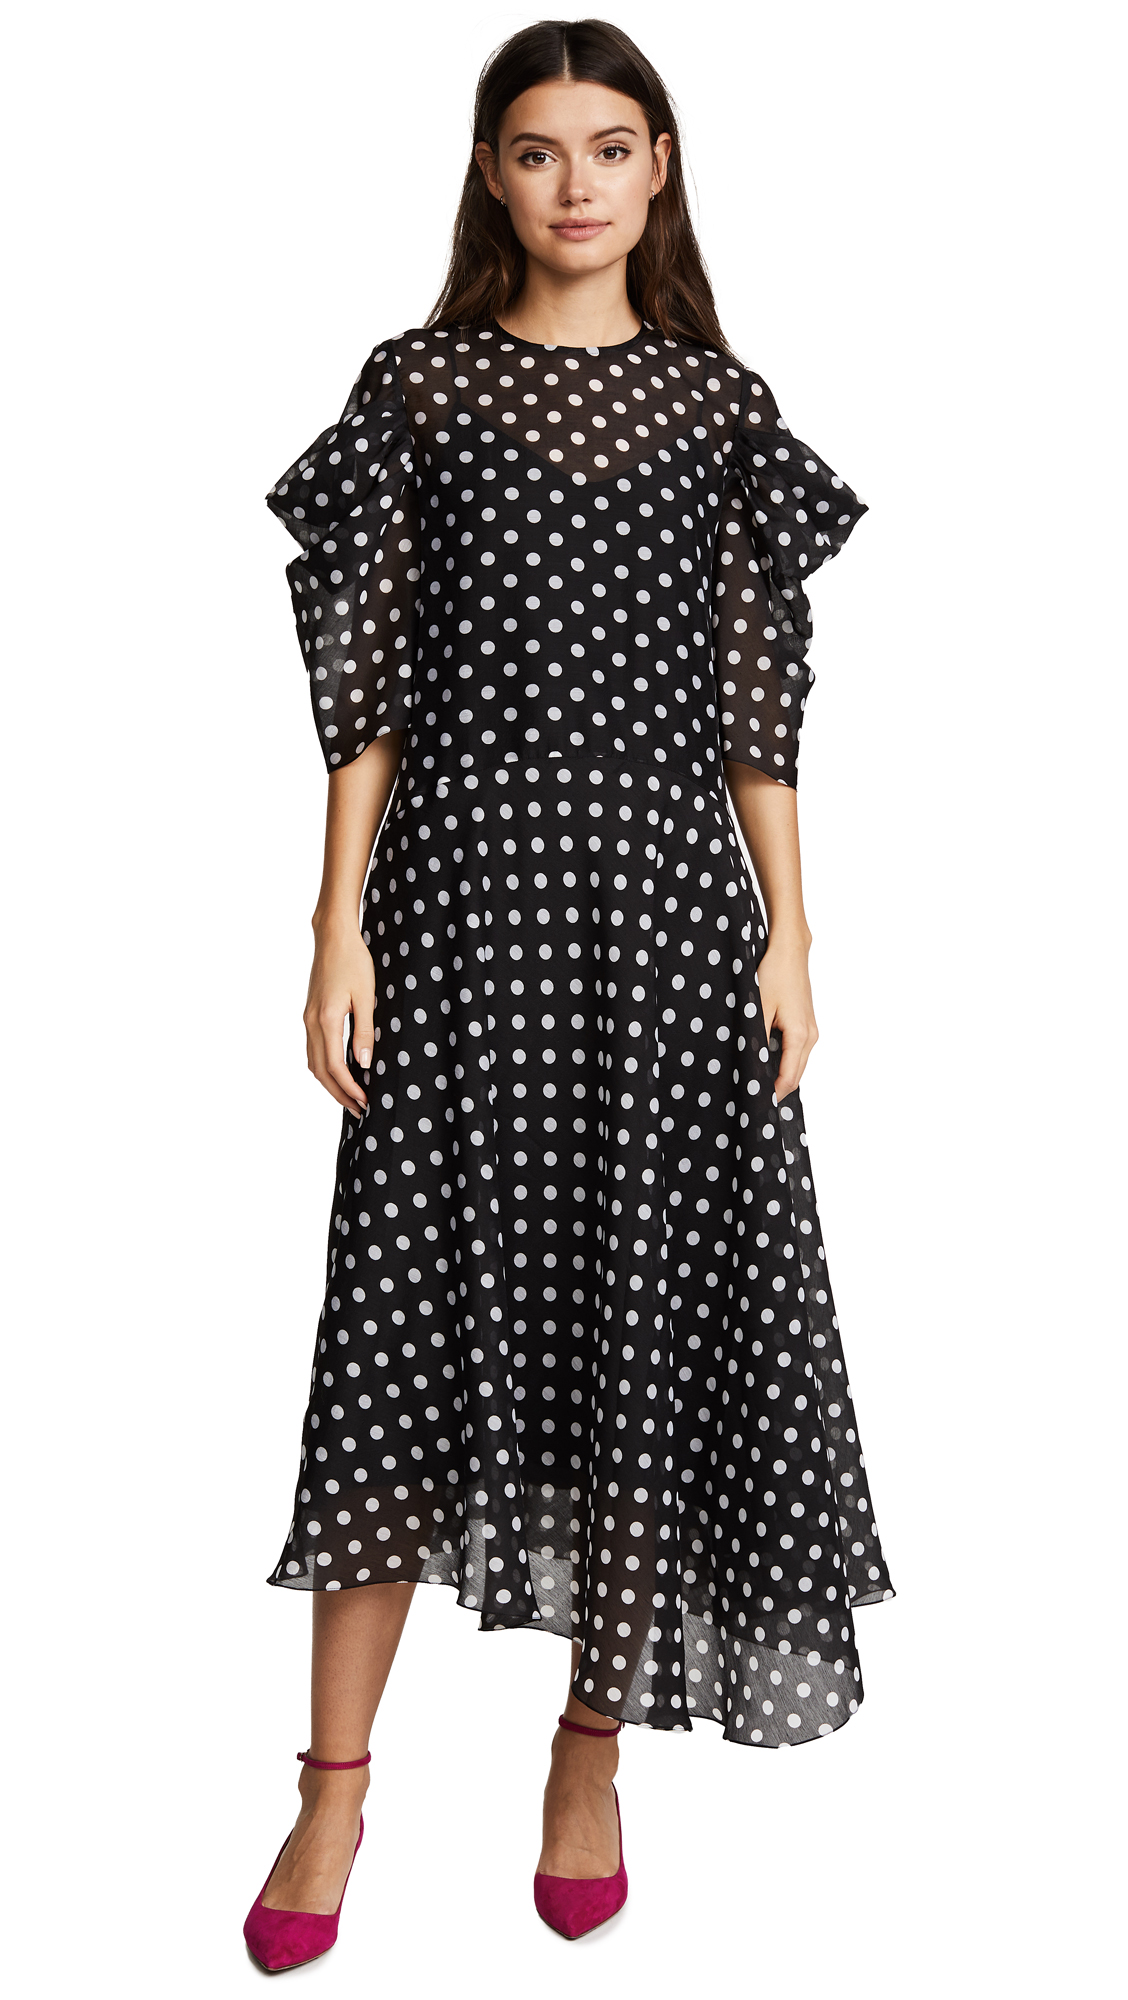 Anna October Polka Dot Dress